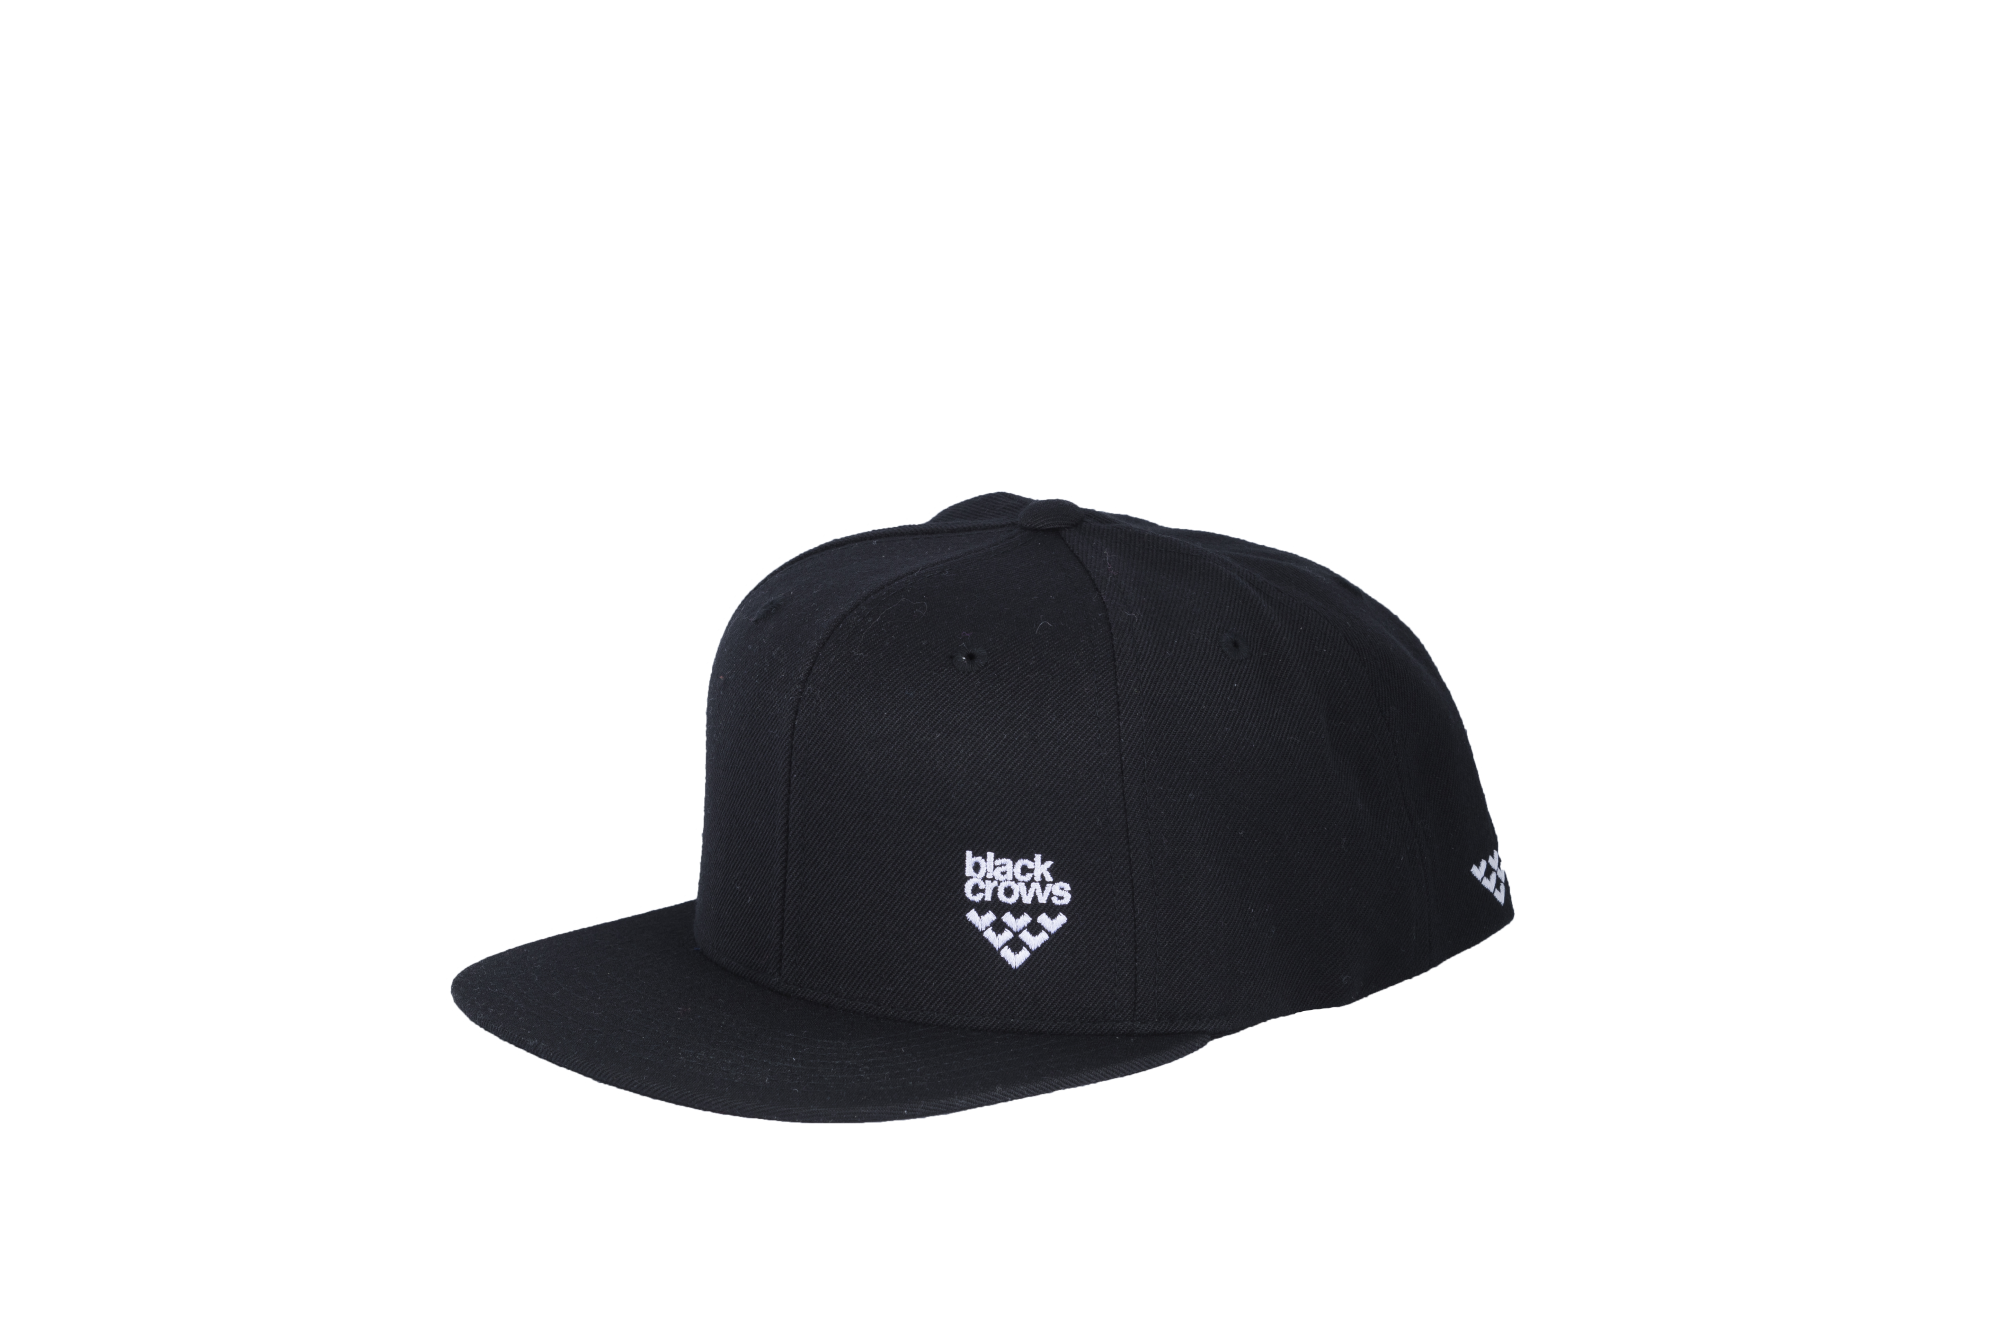 Black Crows Trucker Hat